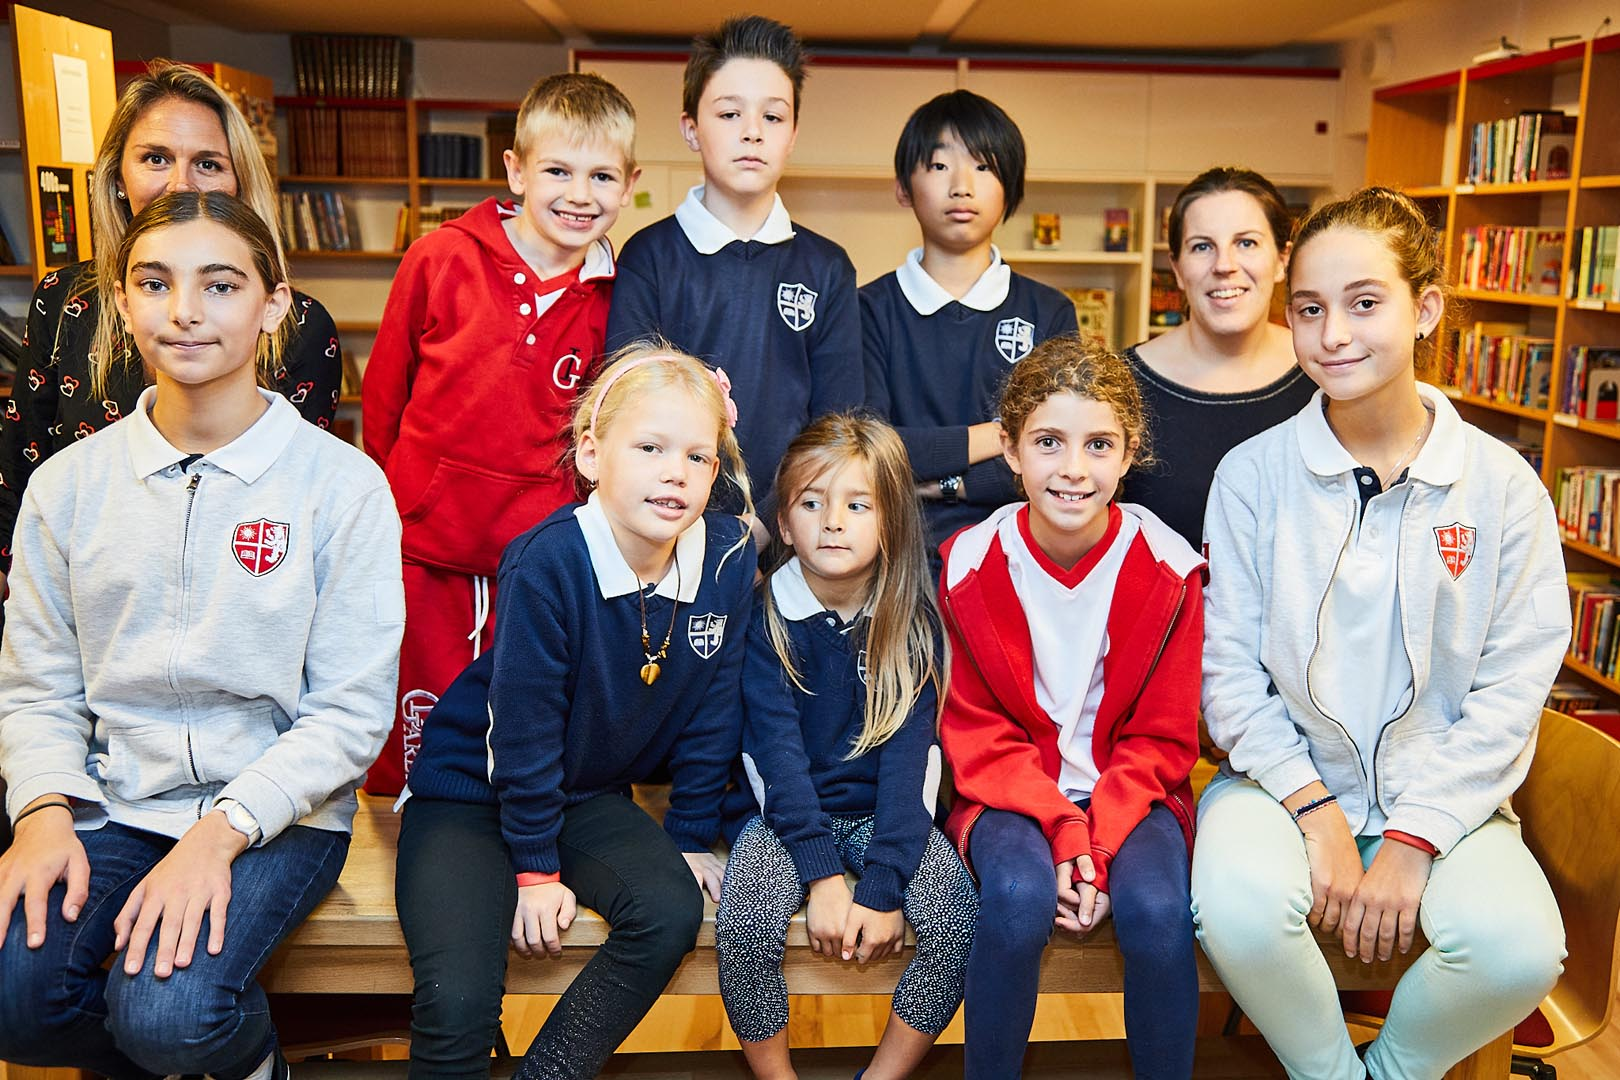 Meet our Student Council Class Representatives